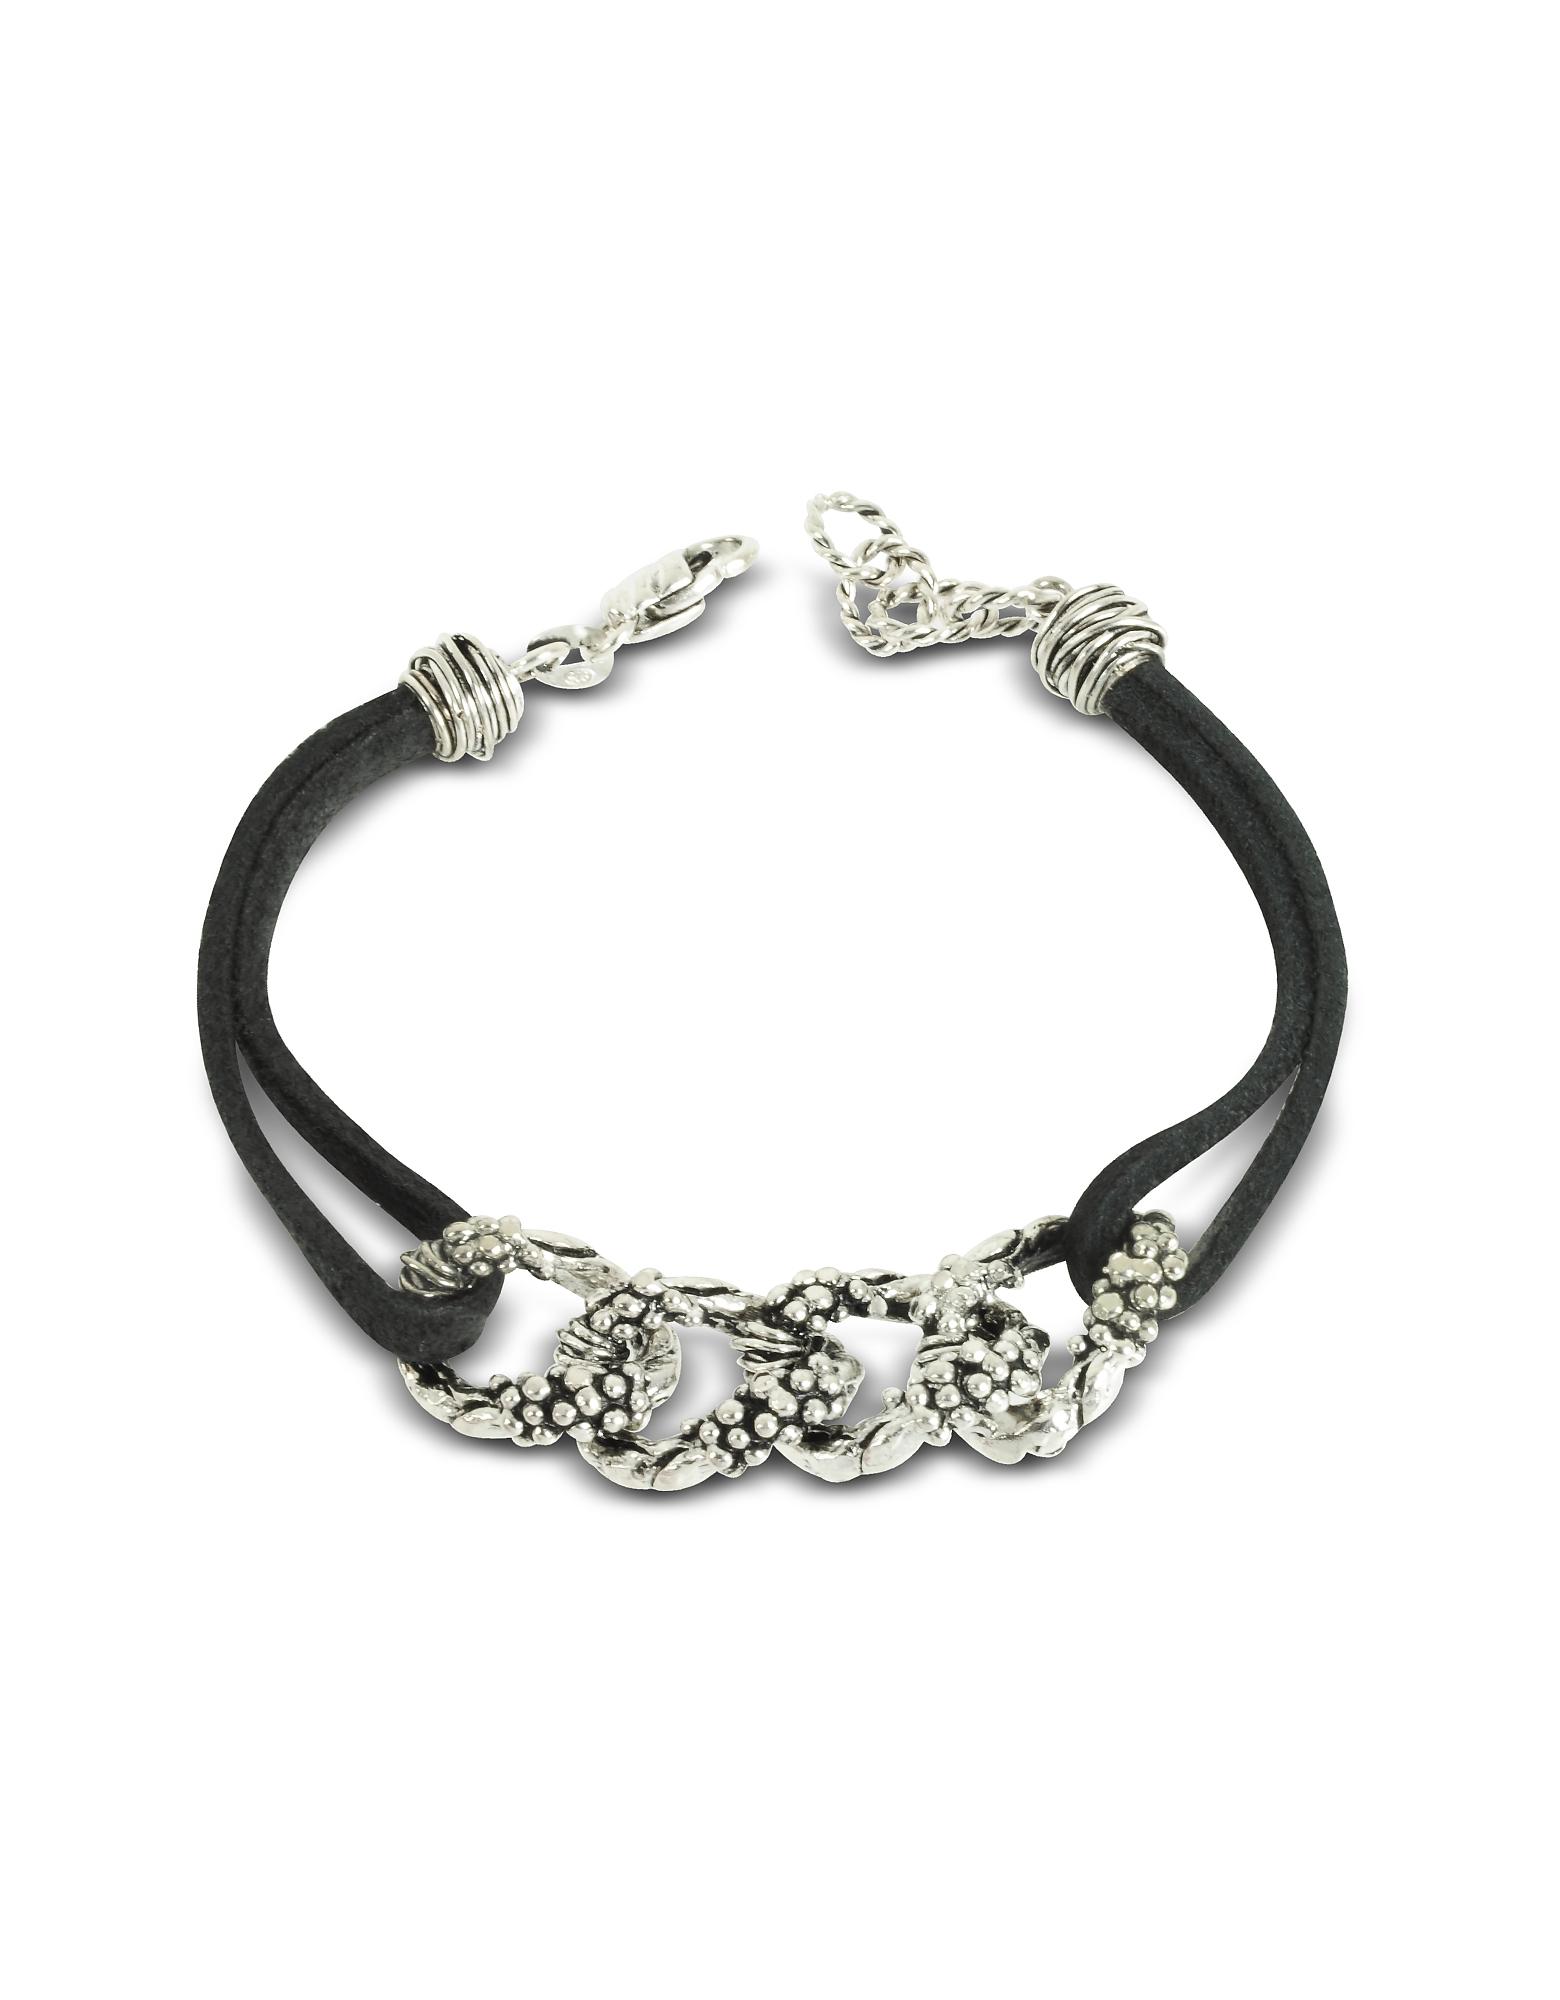 Giacomo Burroni Men's Bracelets, Leather Bracelet w/Links